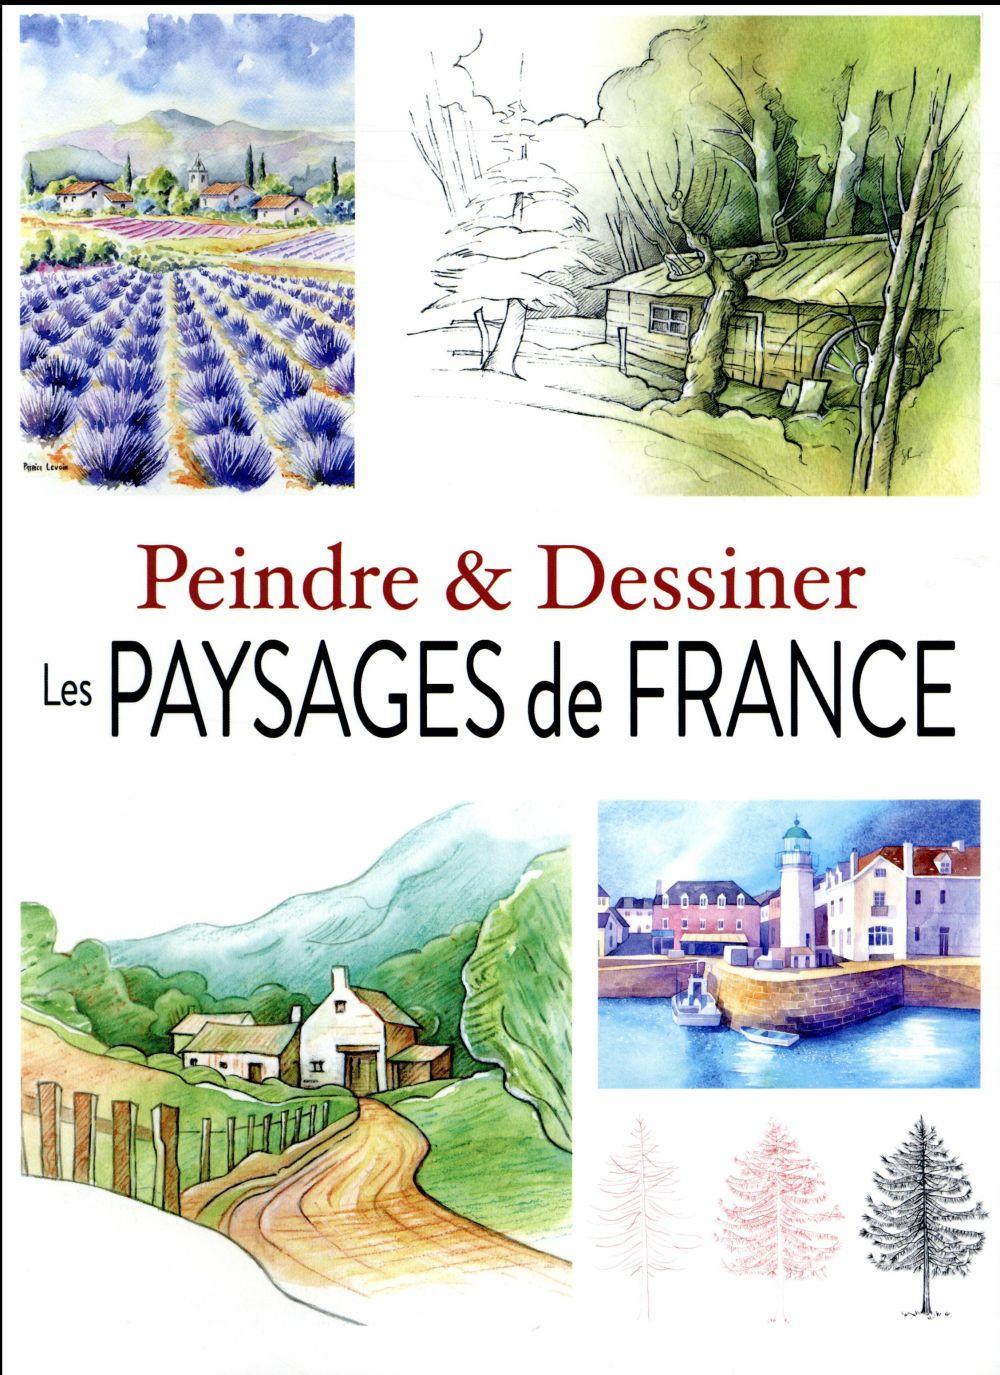 Peindre & dessiner les paysages de France